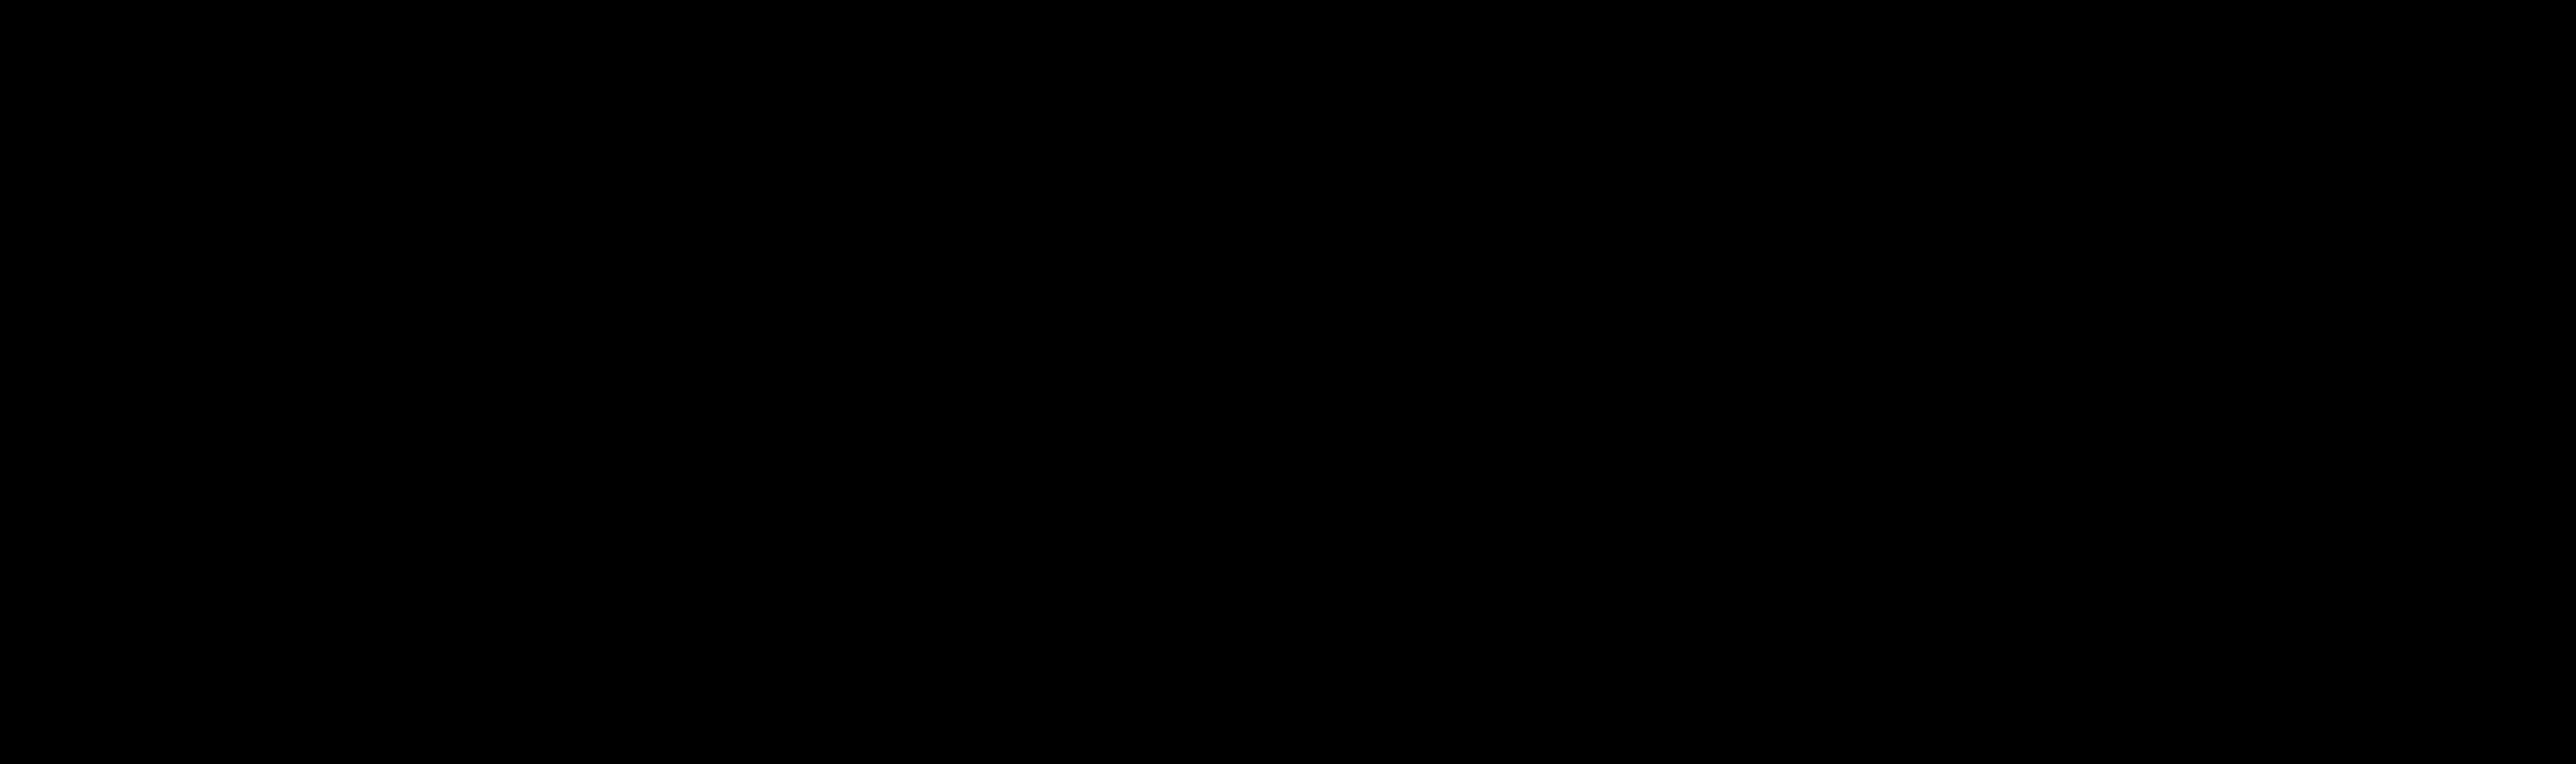 Variant – Commercial Trailer – 3021 P3 (454x210x93 cm)